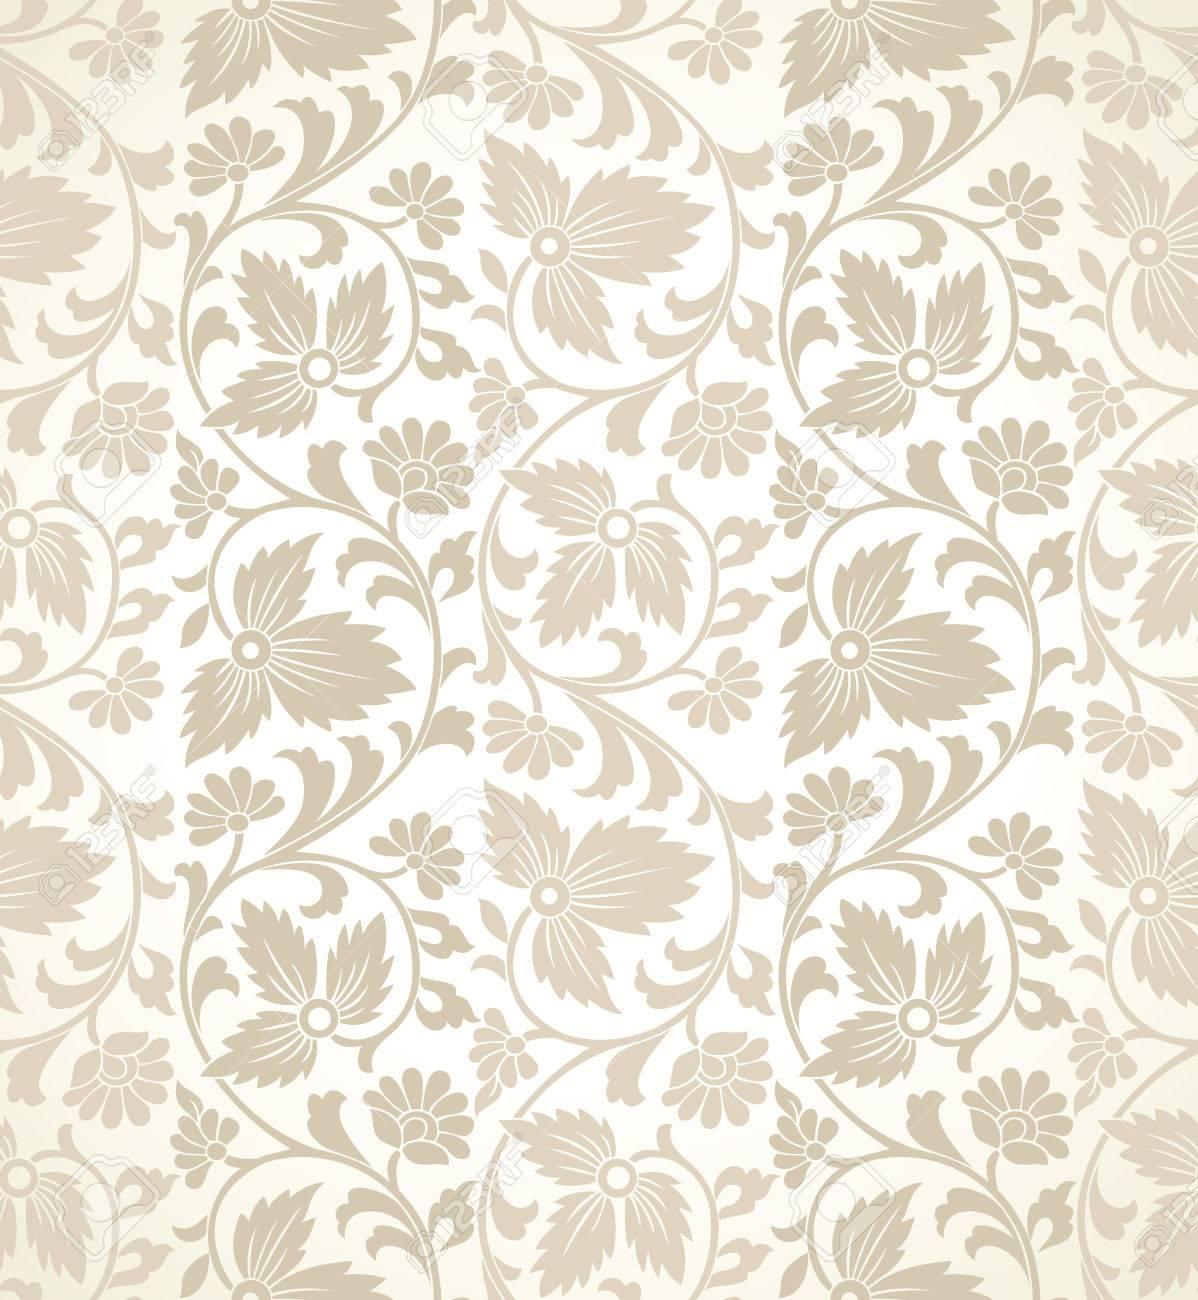 Traditional Floral Vector Wallpaper Royalty Free Cliparts Vectors